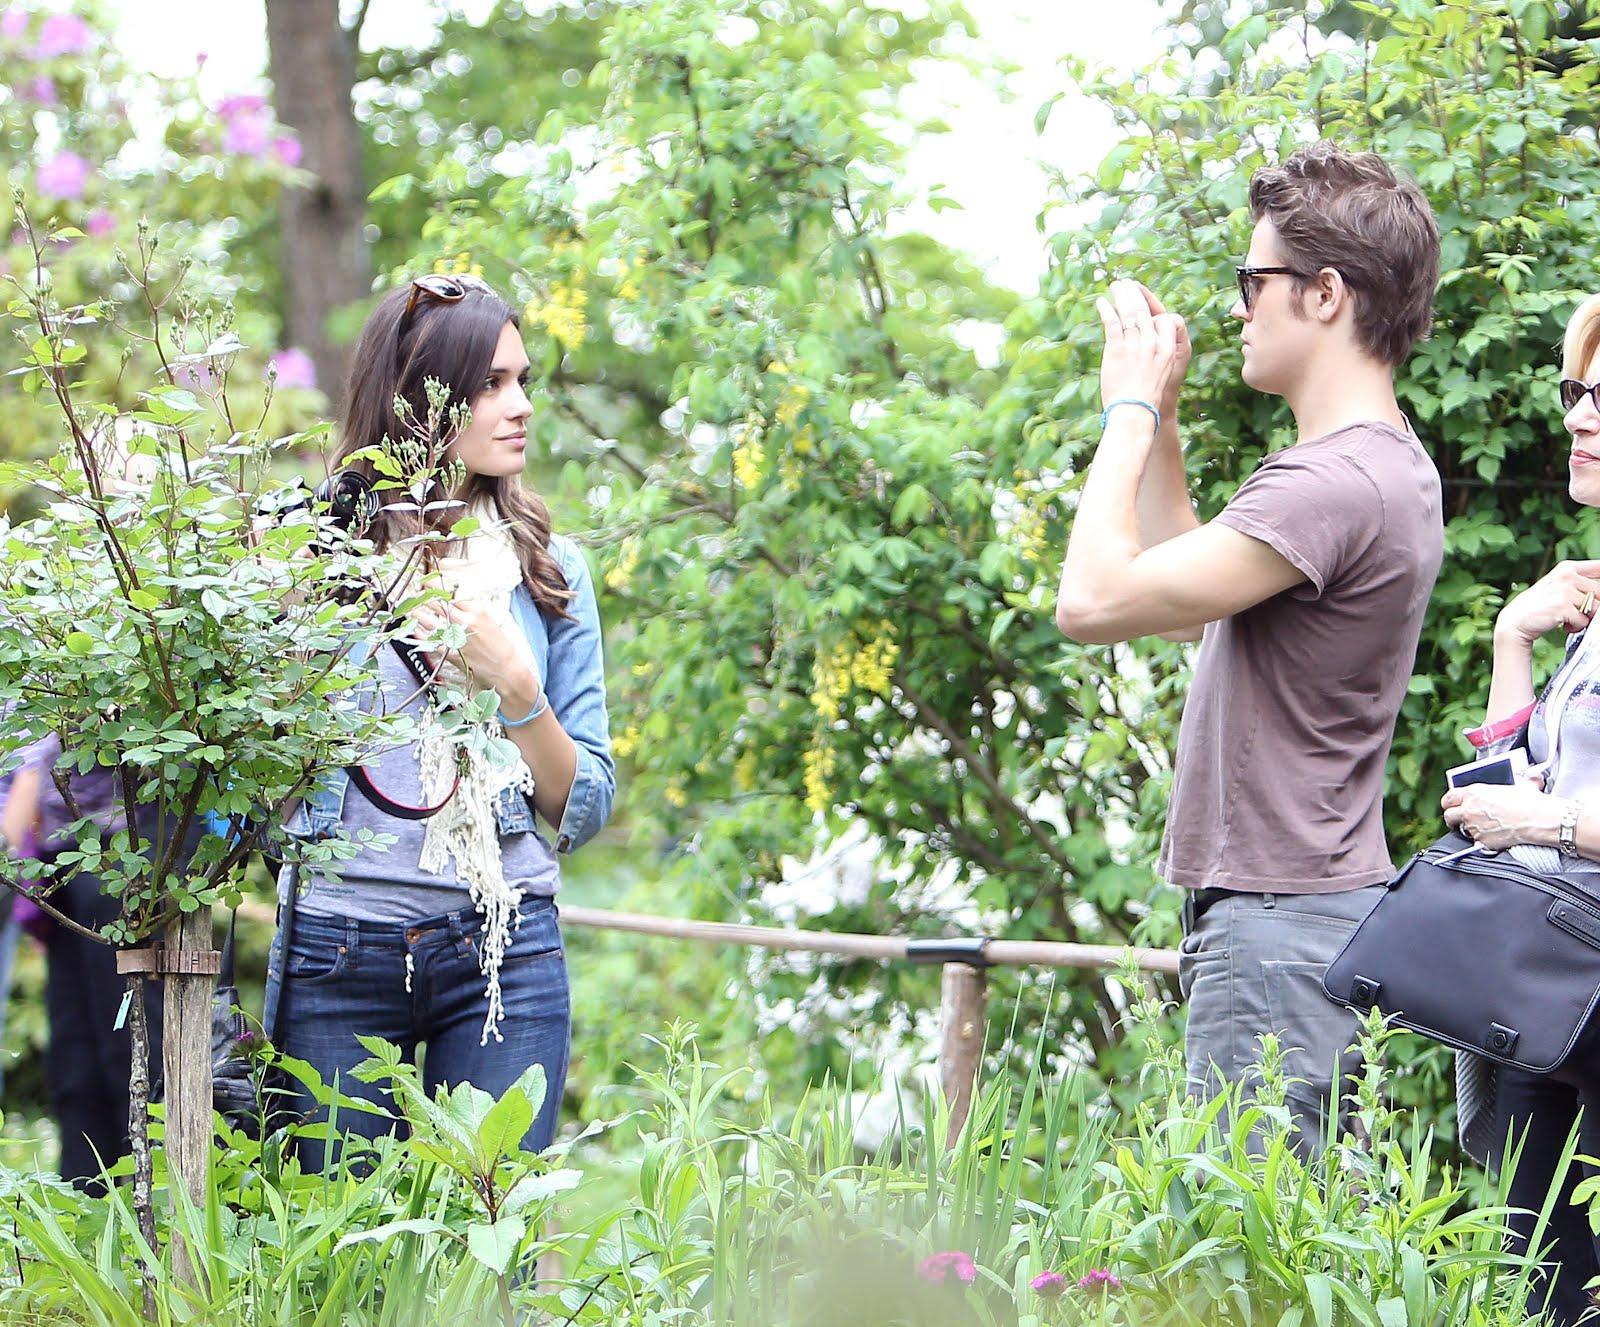 http://4.bp.blogspot.com/-zxu2e6r9qwI/T8JpKvw9fPI/AAAAAAAABuk/lT8lS48szUw/s1600/paul-wesley-torrey-devitto-garden-photoshoot.jpg